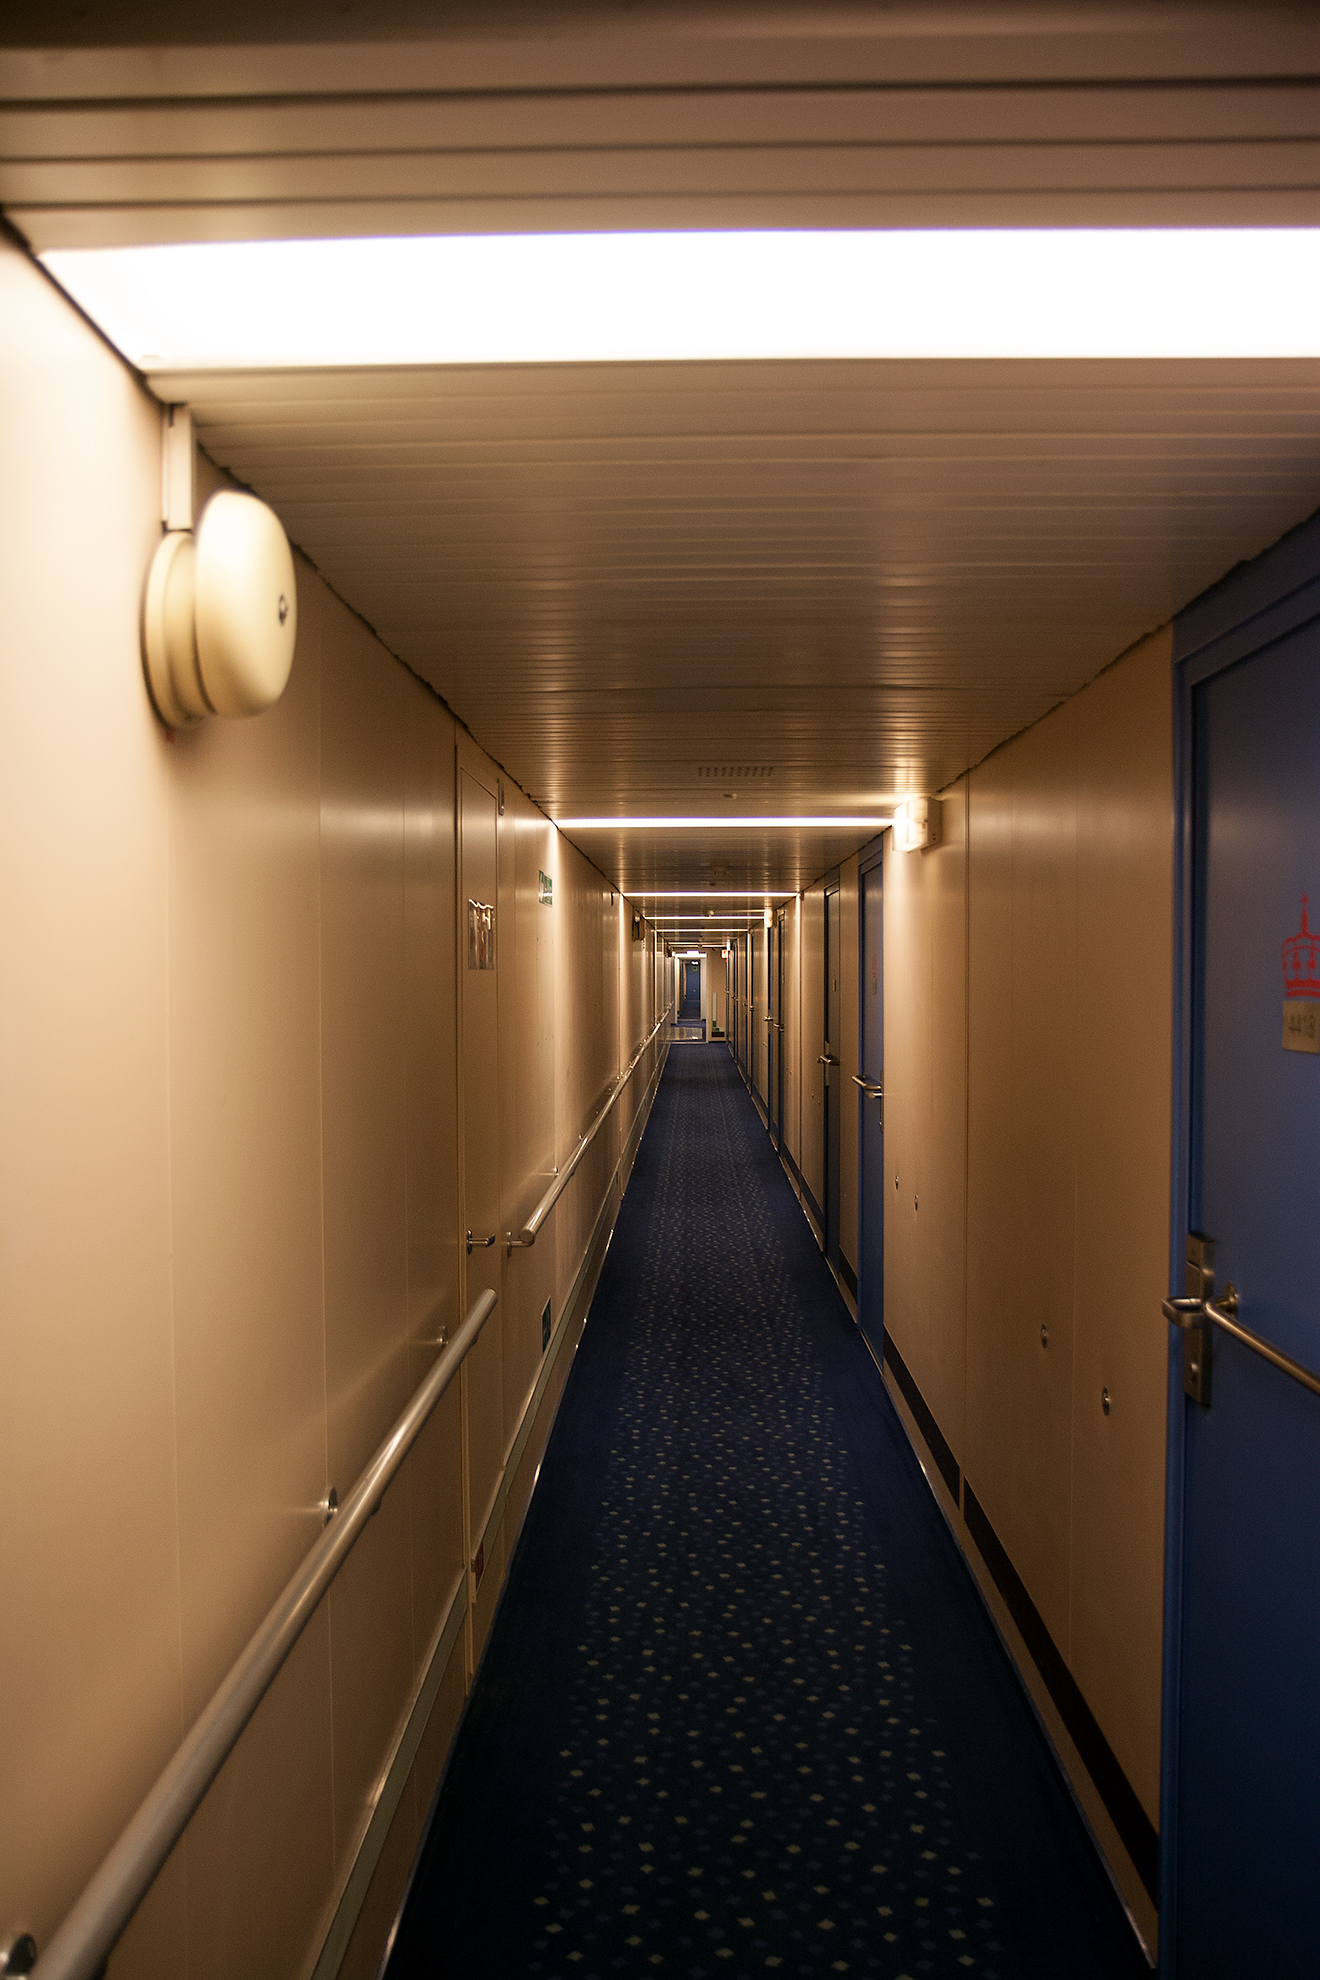 Long hallways inside